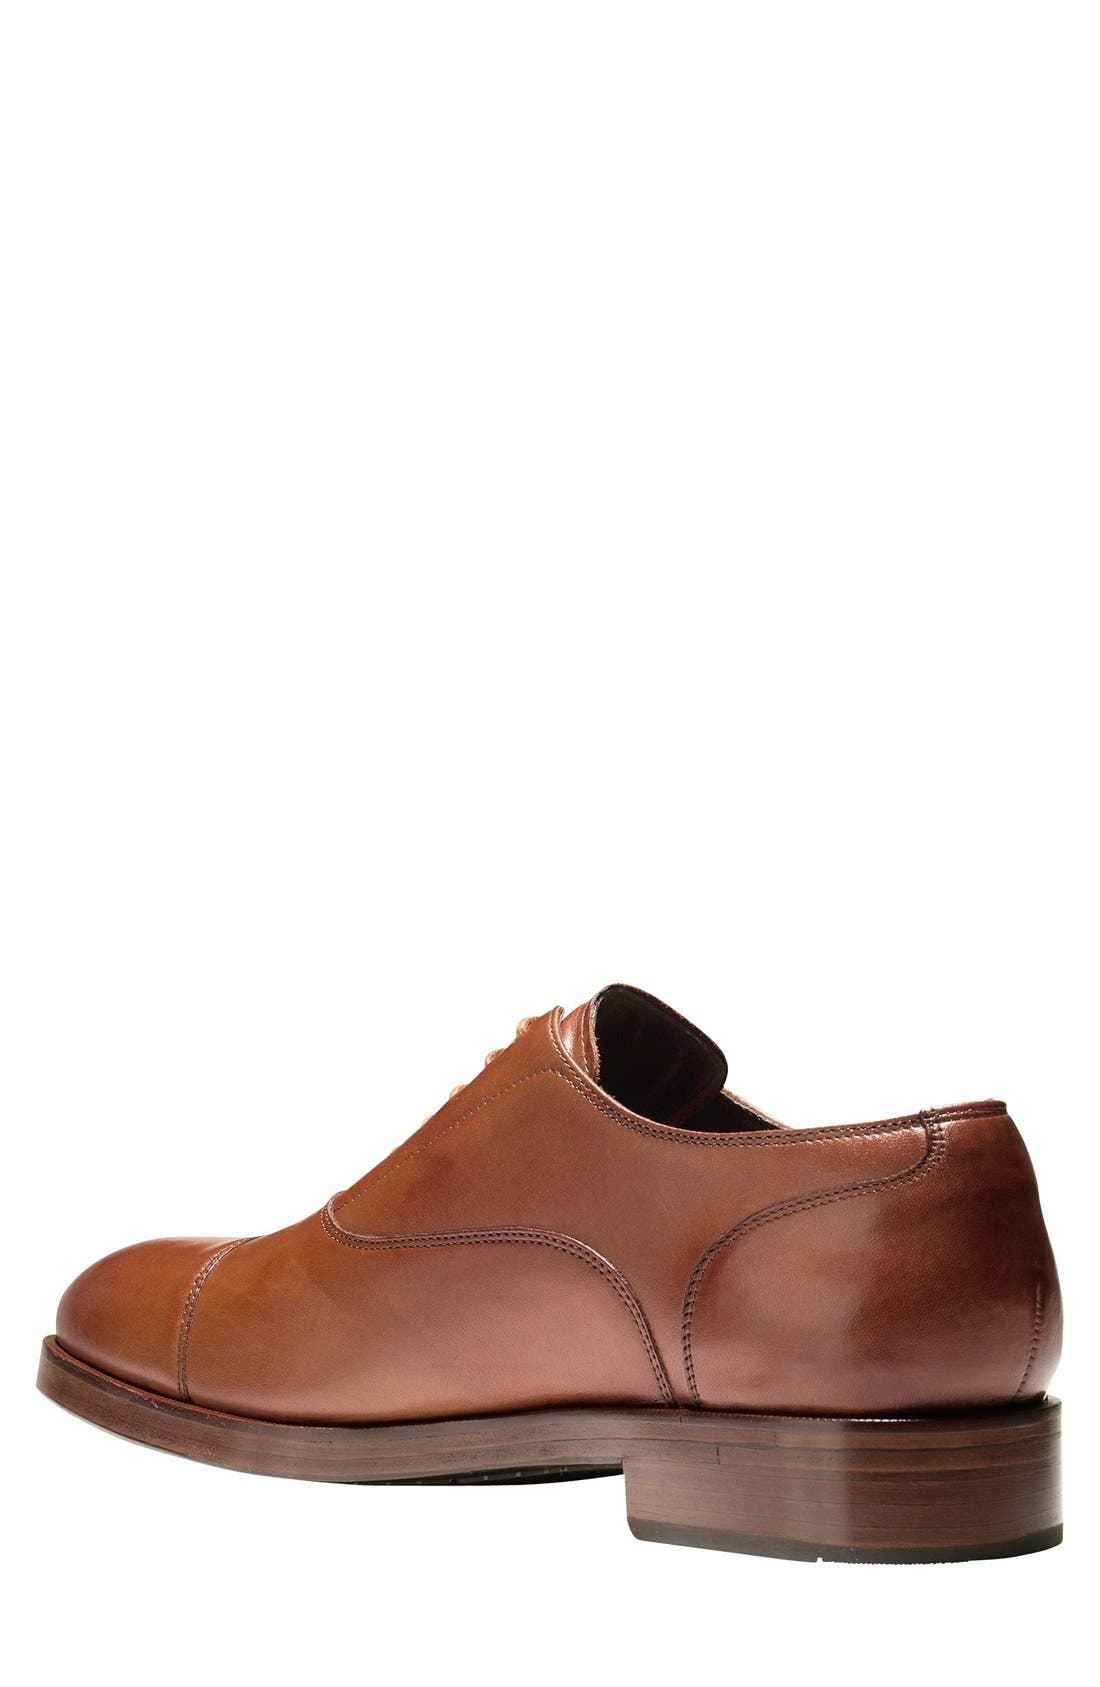 Harrison Grand Cap Toe Oxford,                             Alternate thumbnail 2, color,                             British Tan Leather